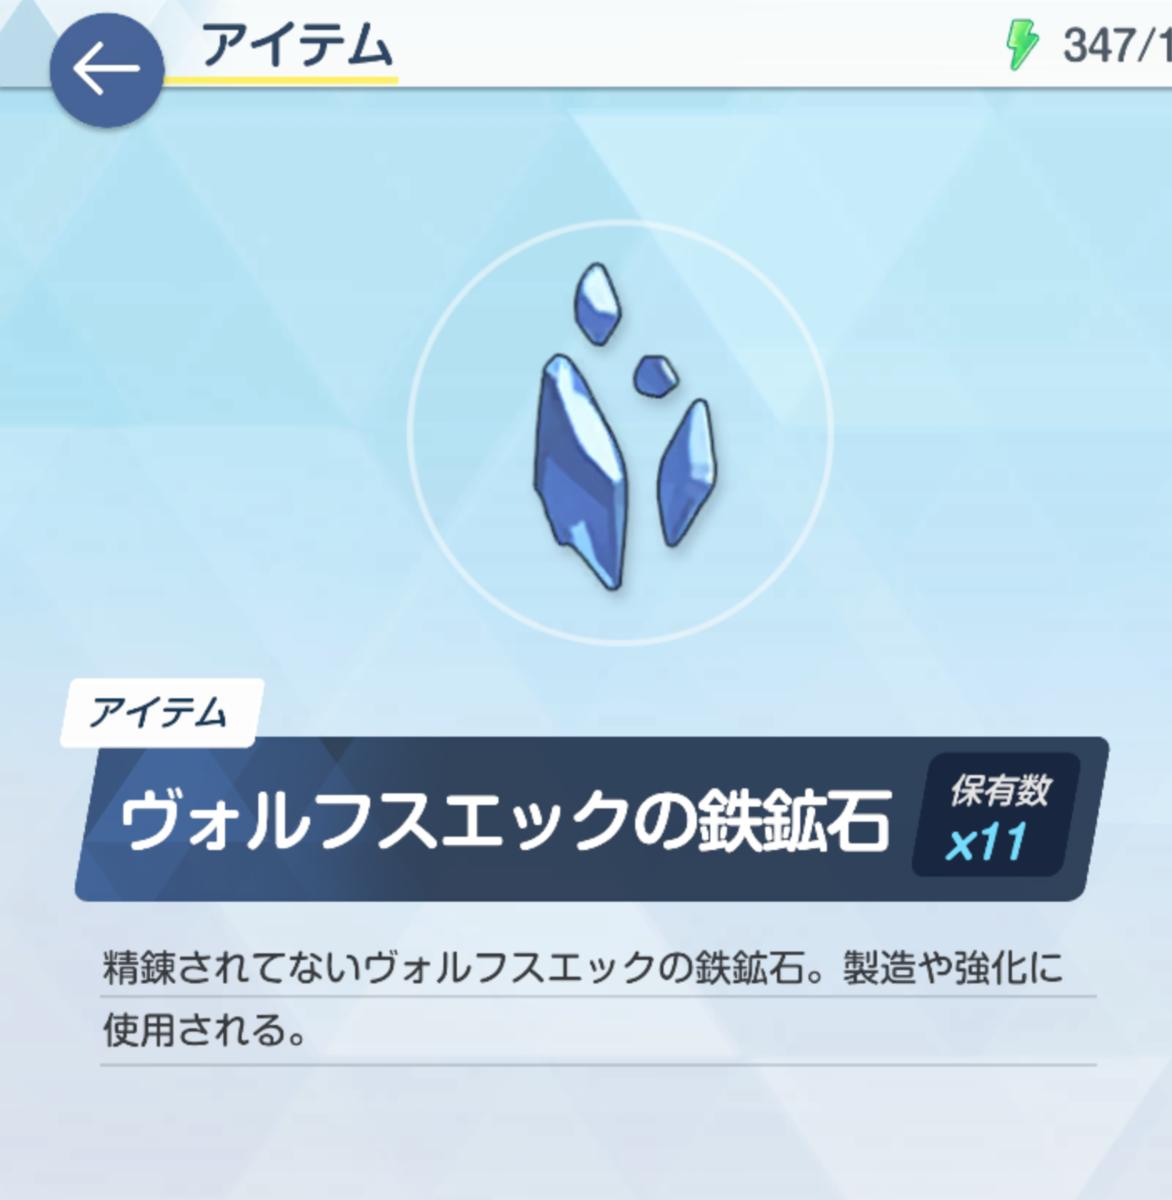 f:id:ichi1223:20210223043212p:plain